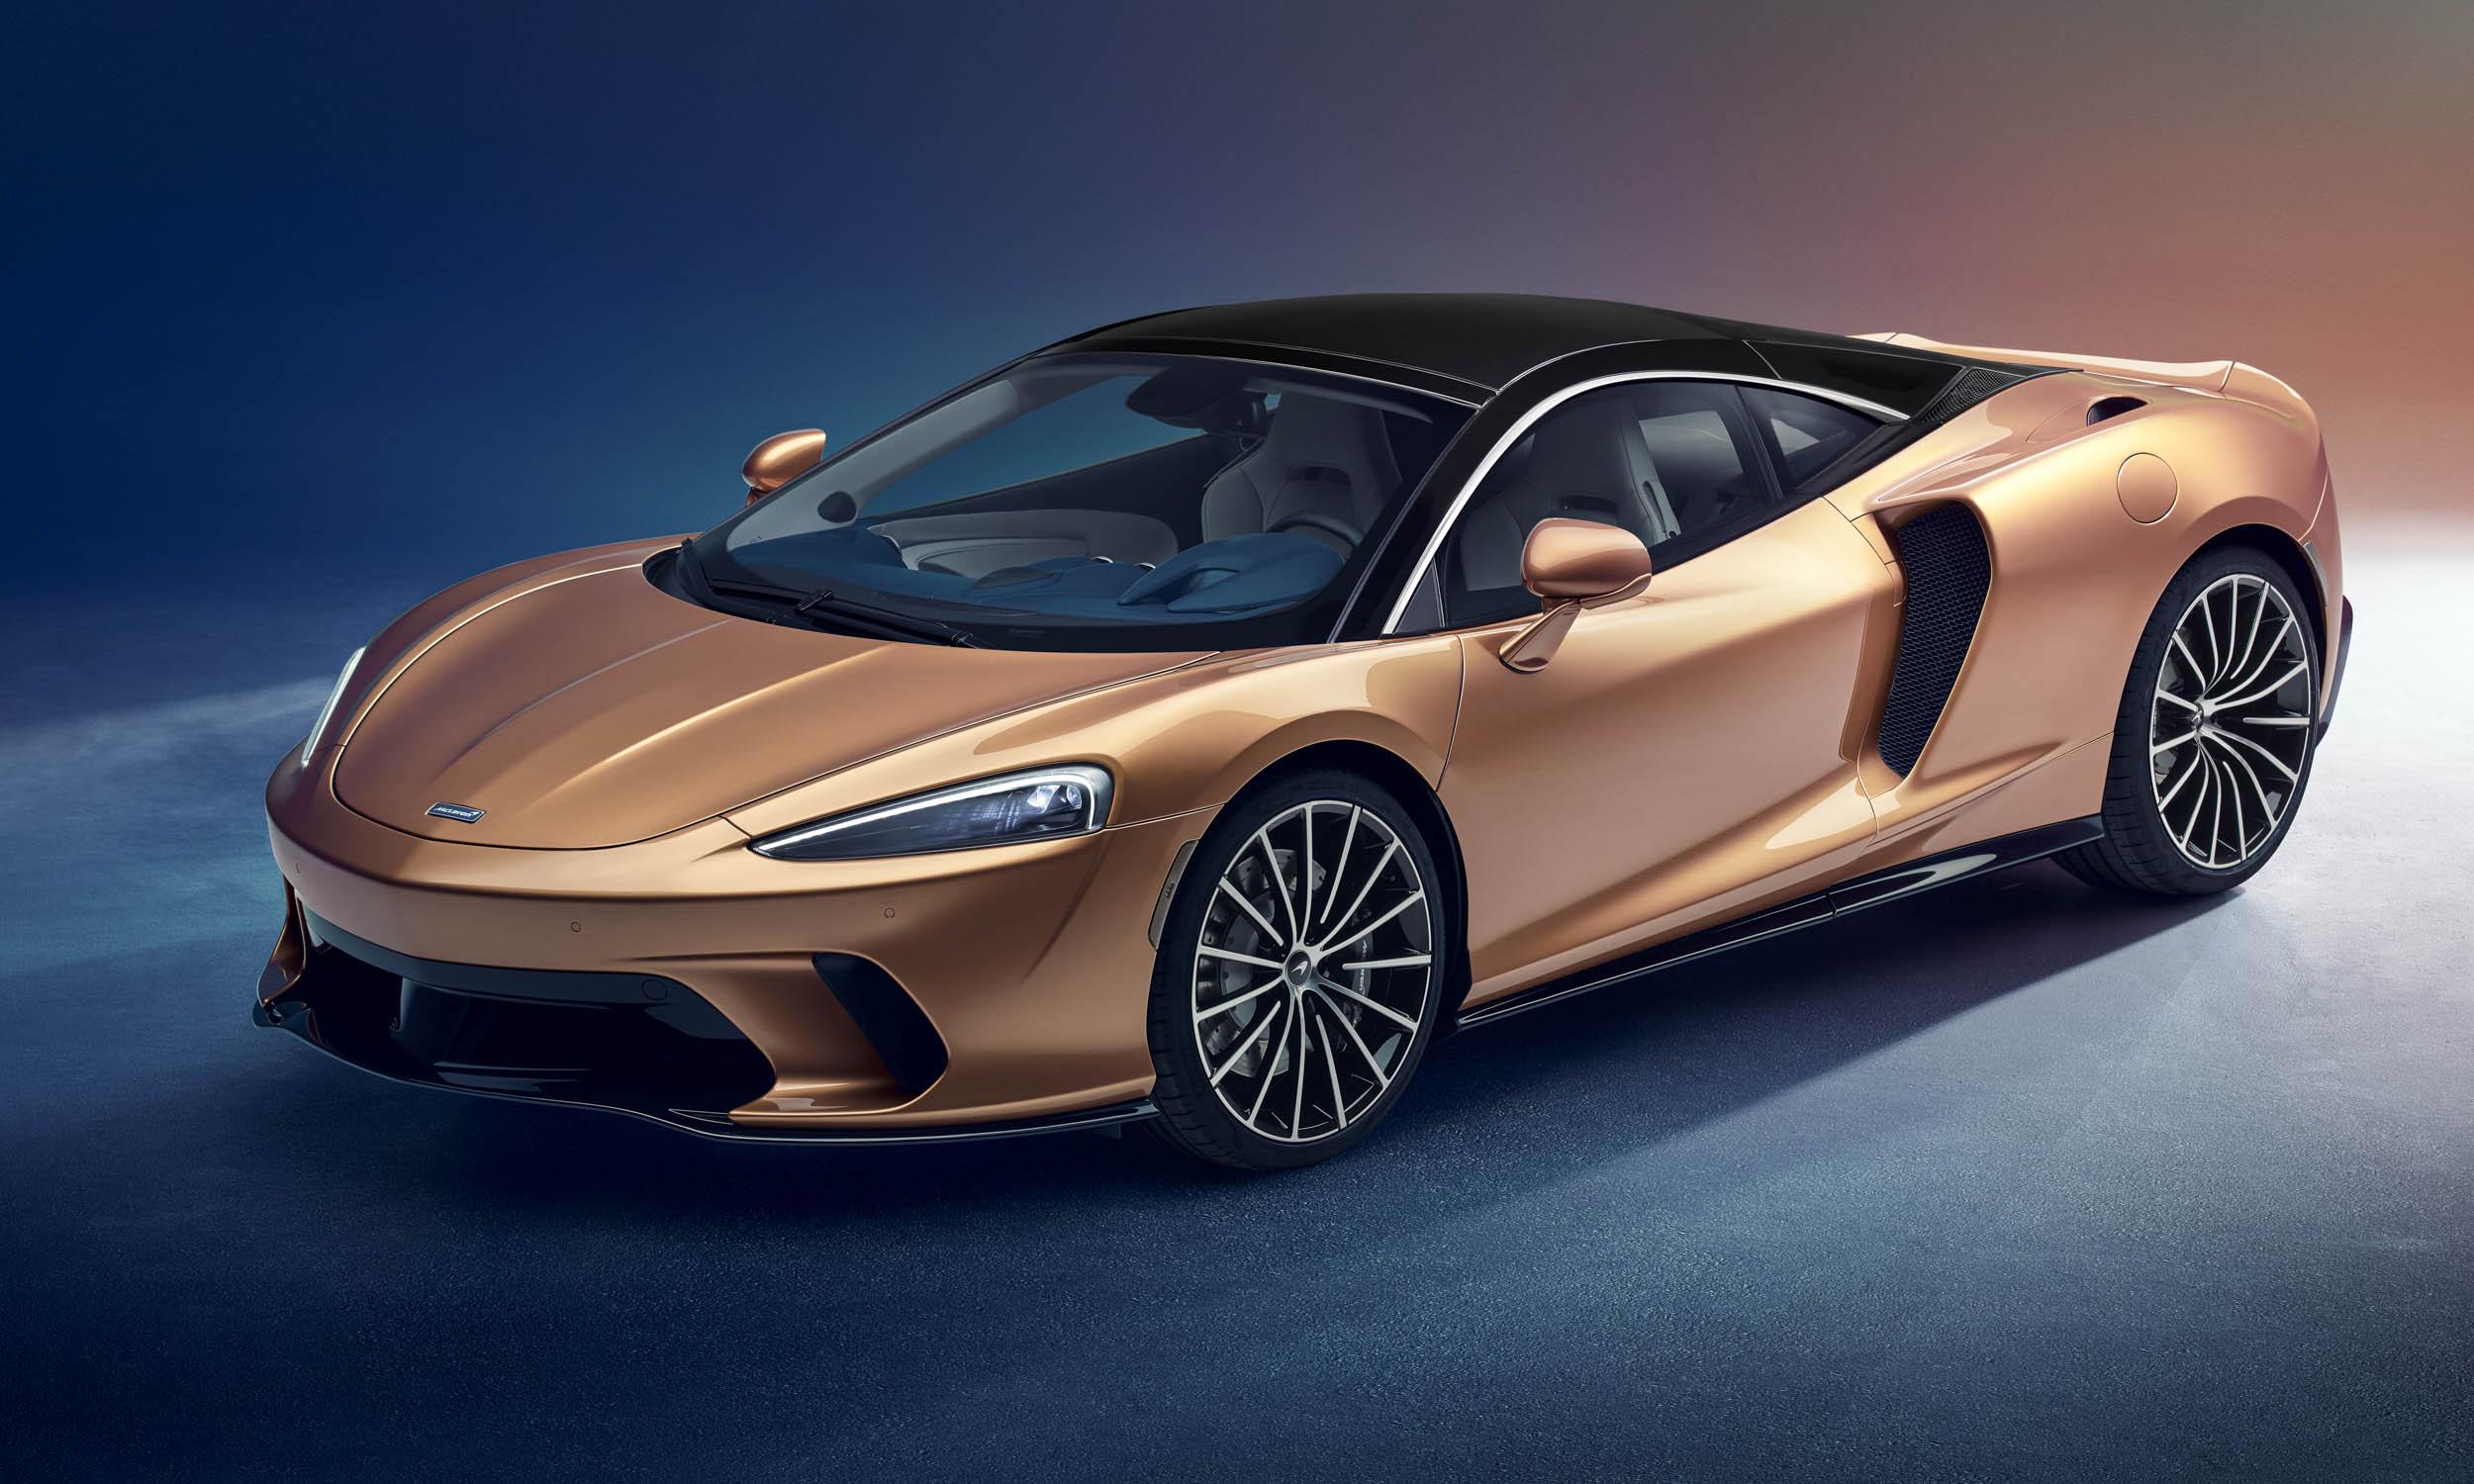 McLaren GT: First Look